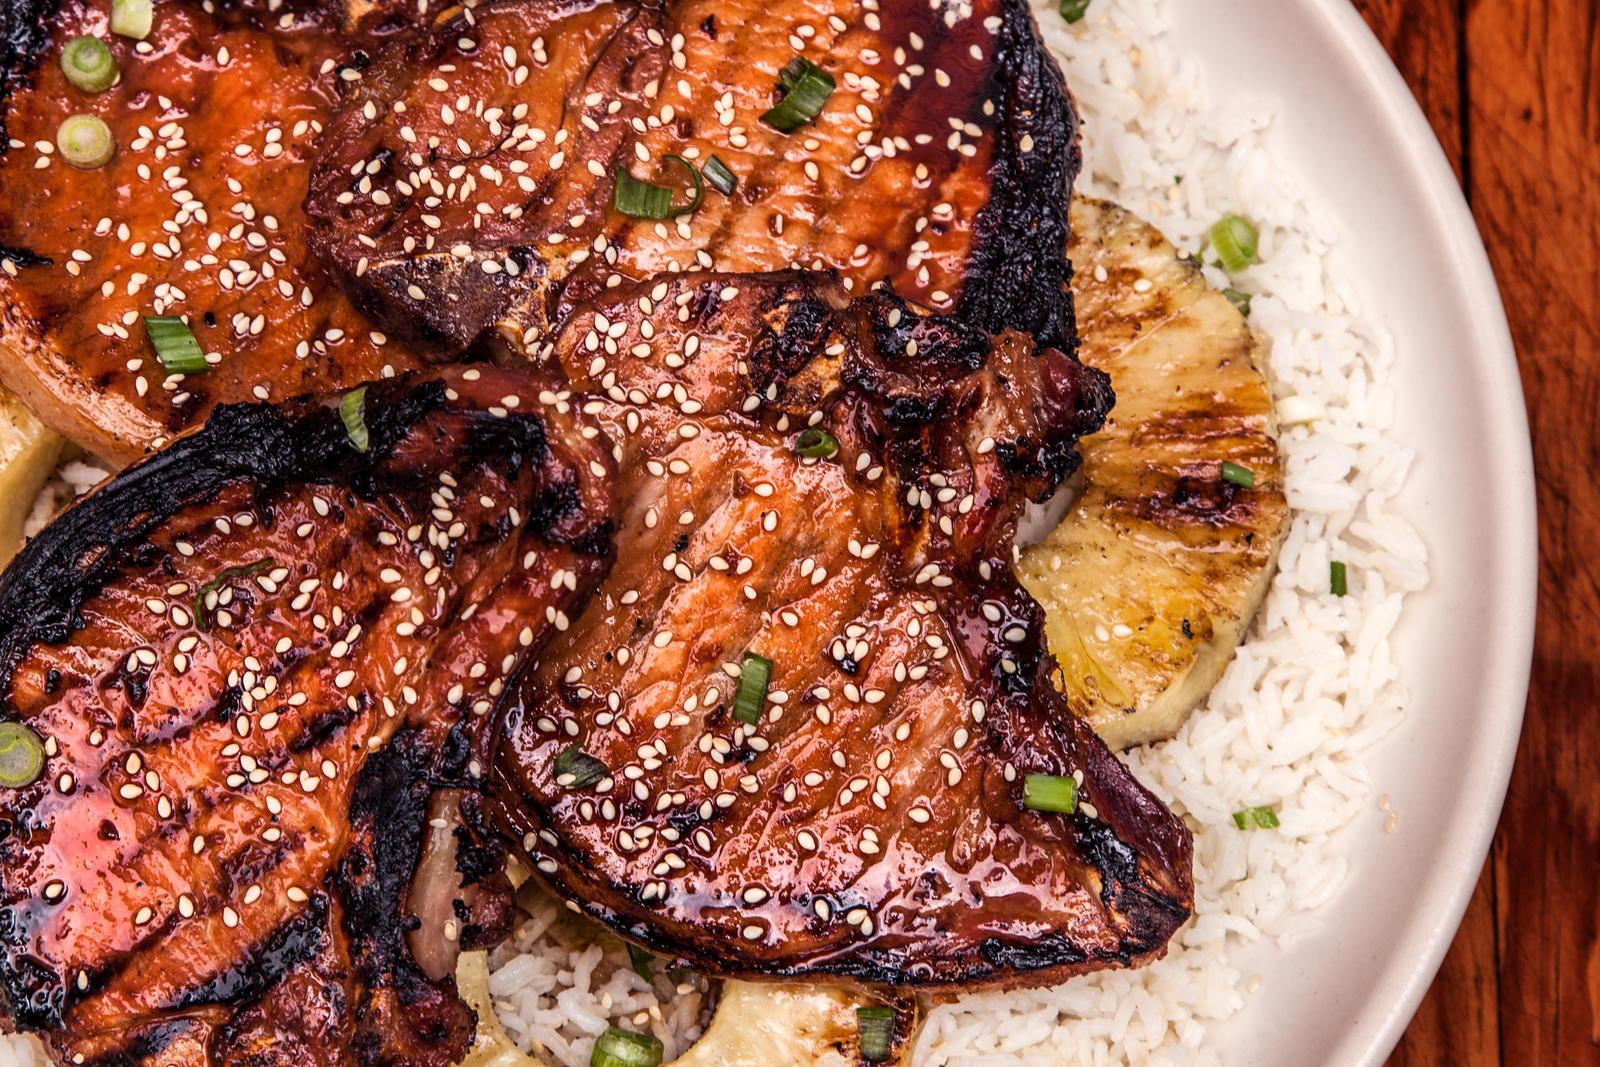 Best Way To Make Pork Chops  How to Make the Best Teriyaki Chicken Chowhound